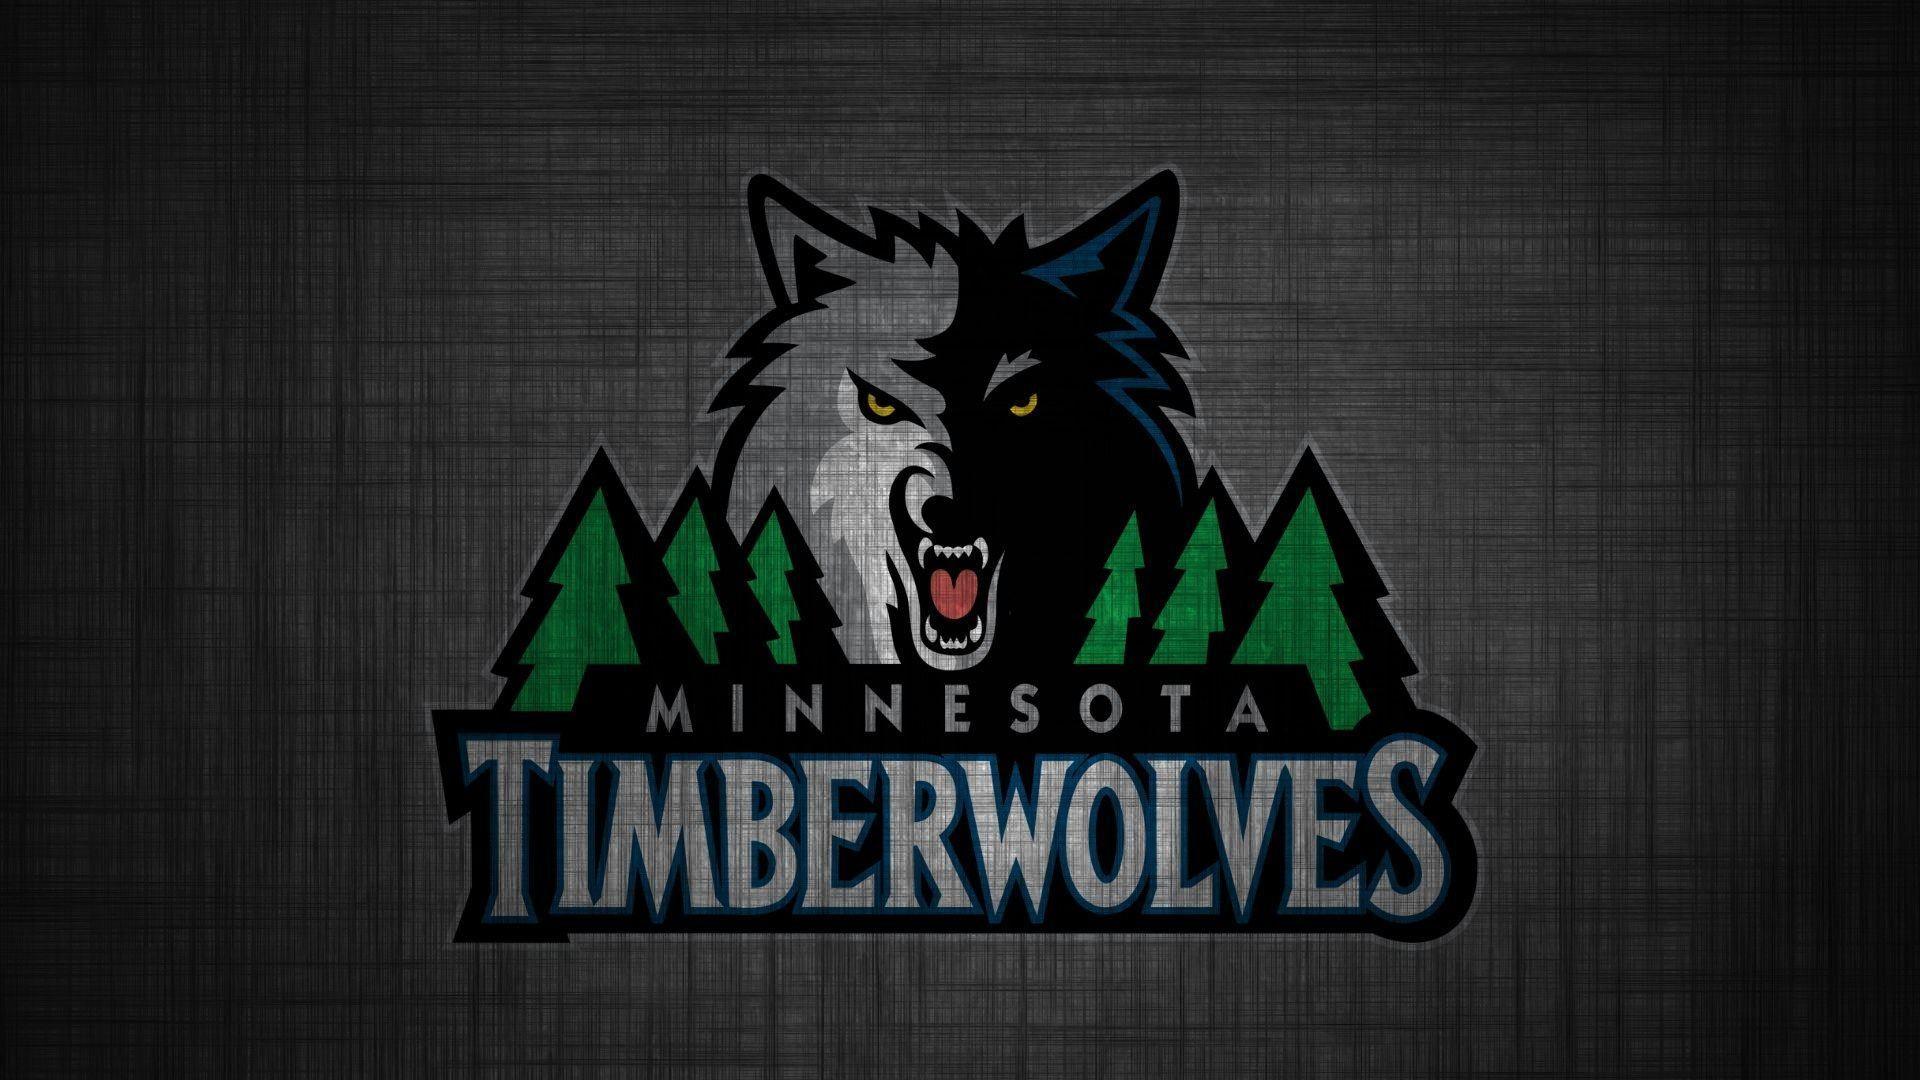 Minnesota Timberwolves computer background